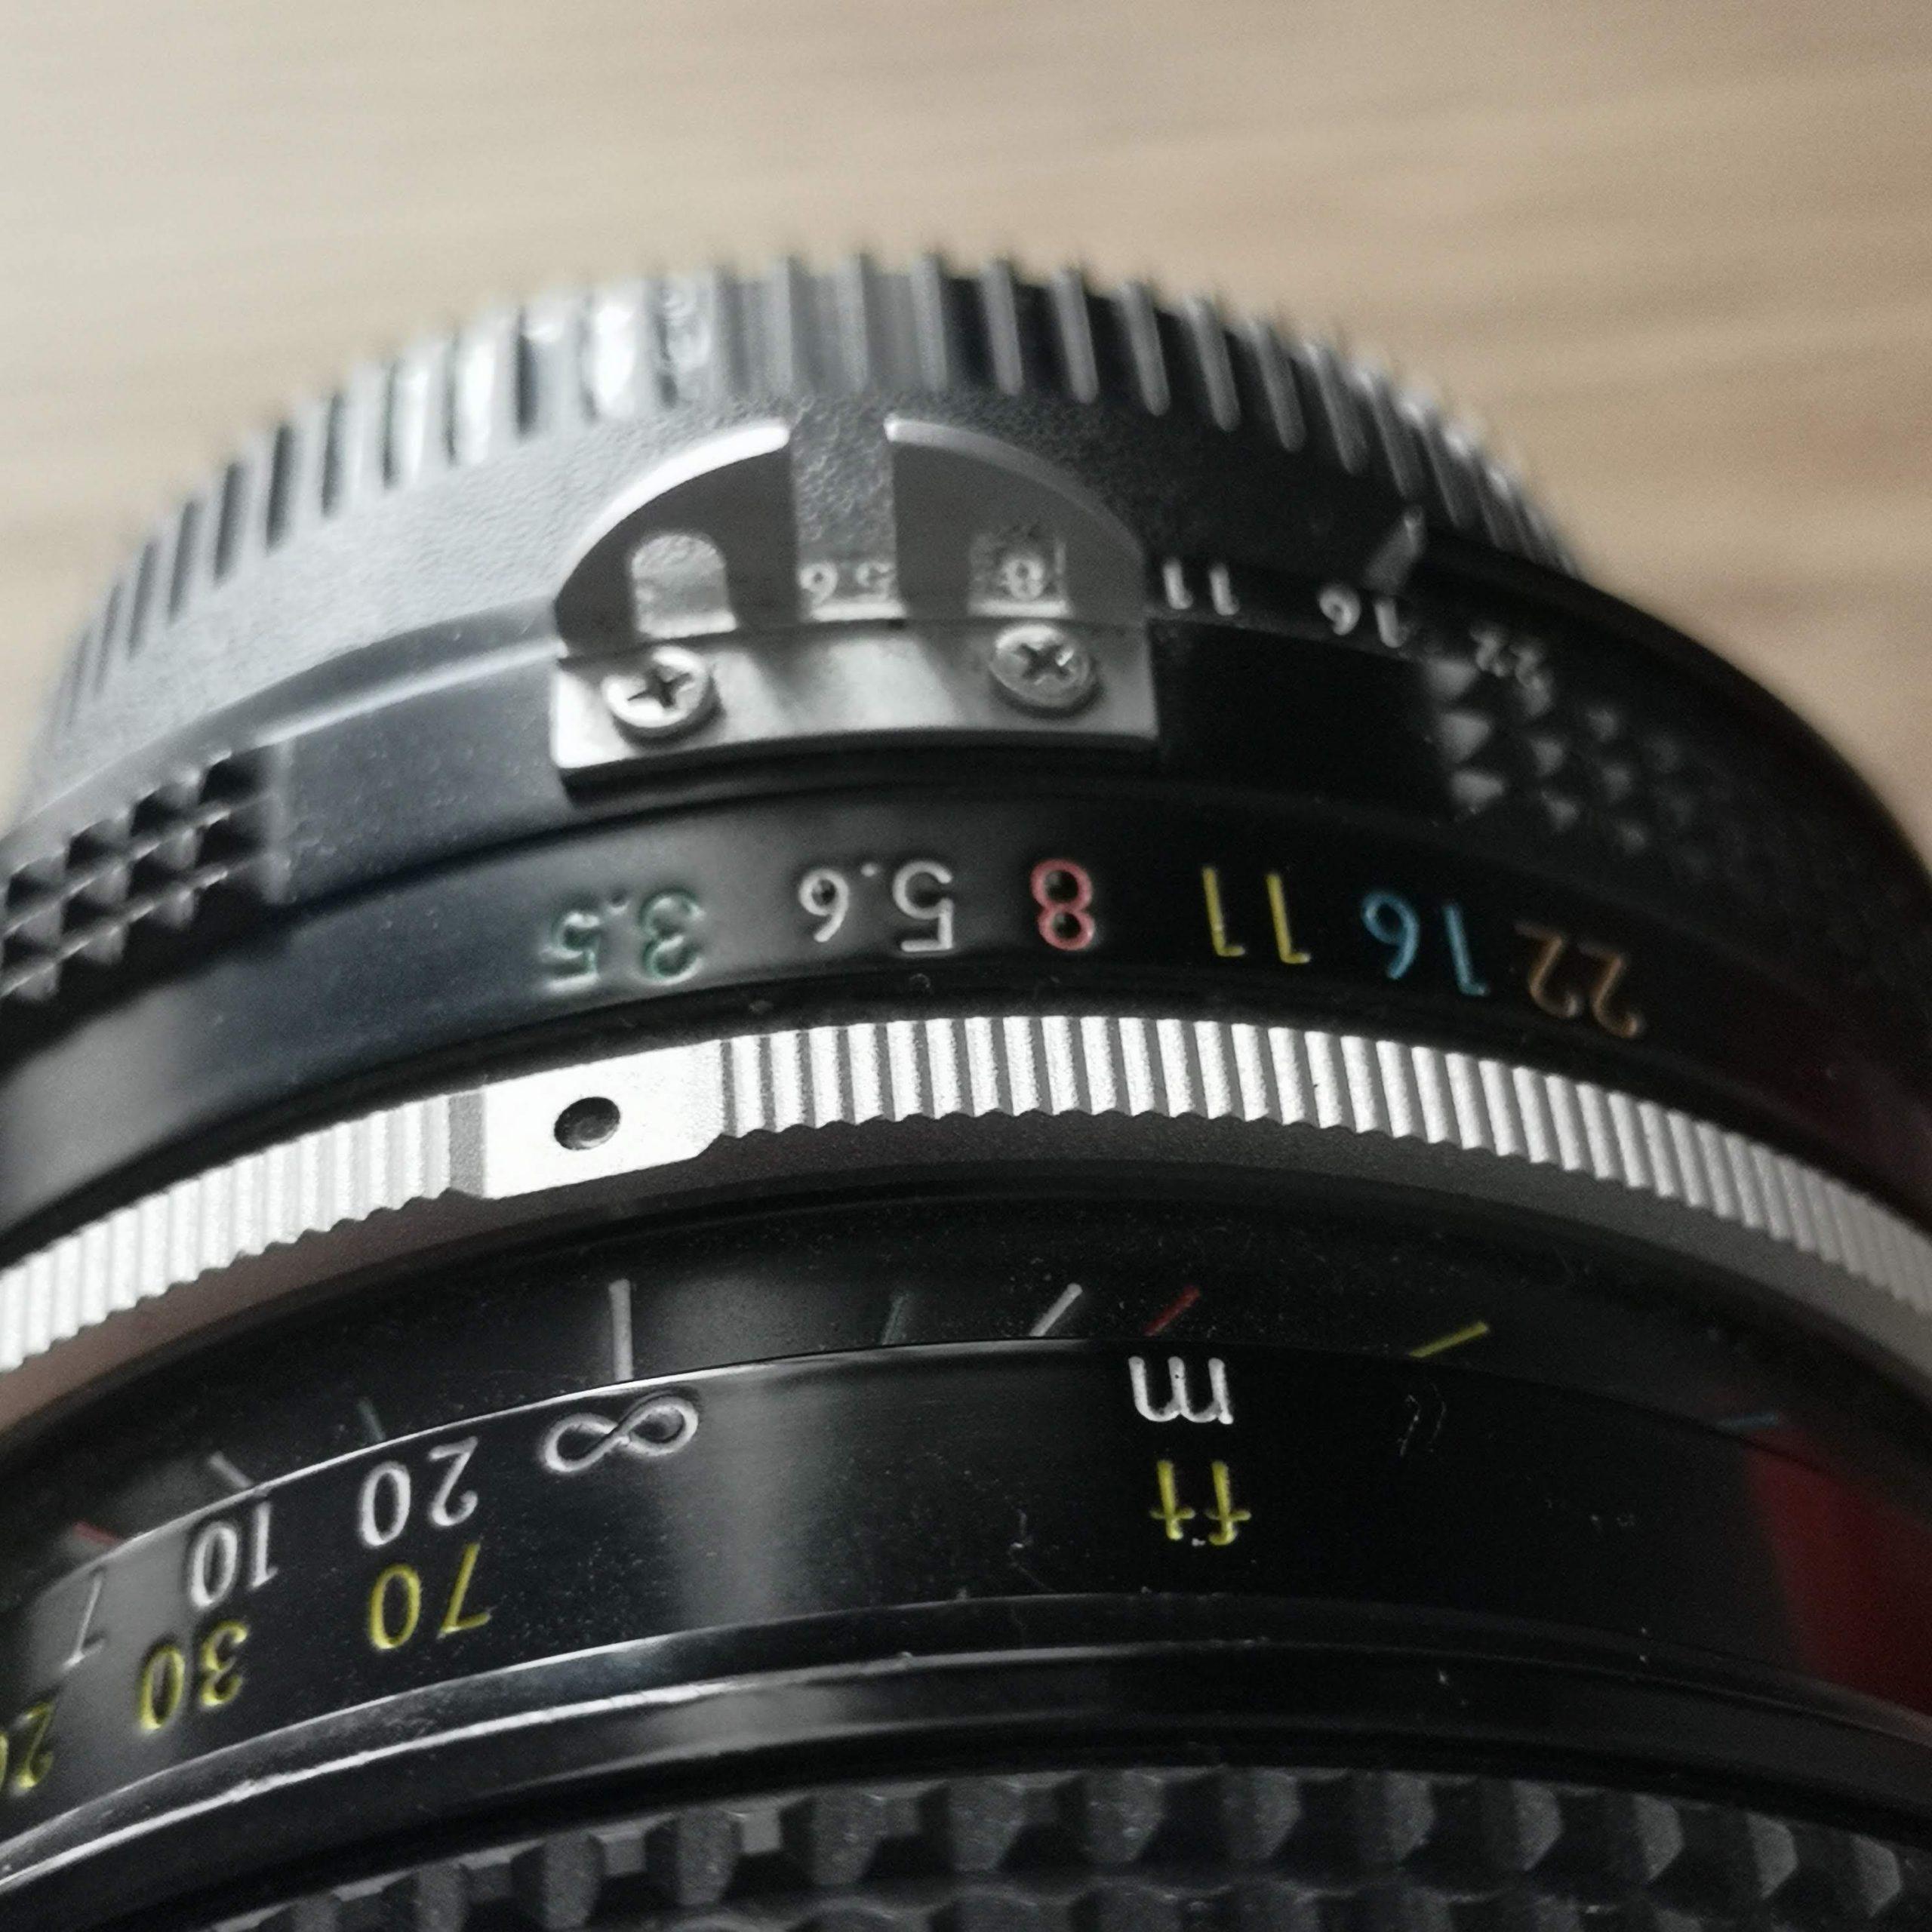 AI lens